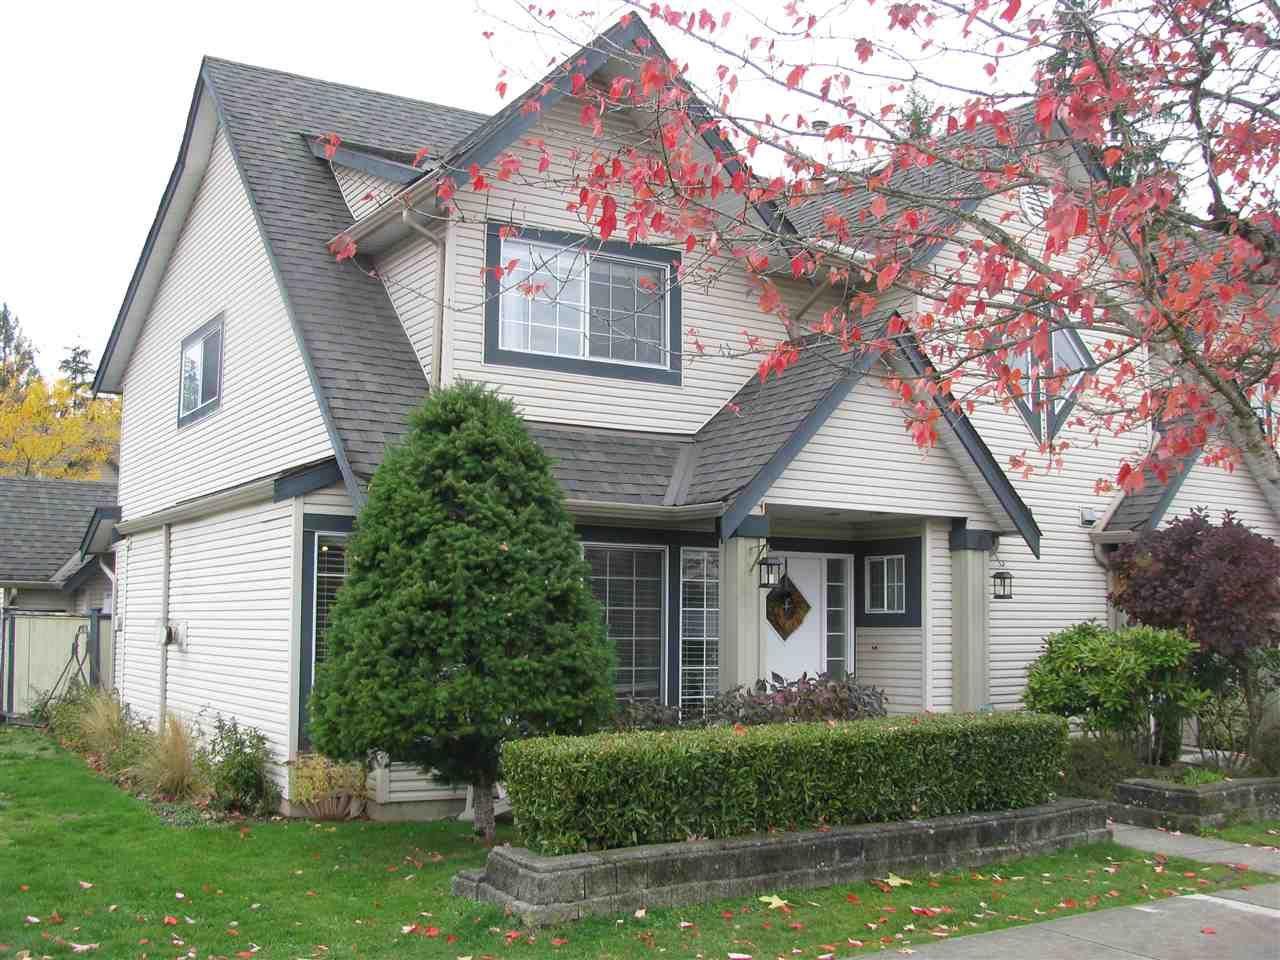 "Main Photo: 16 11536 236 Street in Maple Ridge: Cottonwood MR Townhouse for sale in ""KANAKA MEWS"" : MLS®# R2219903"